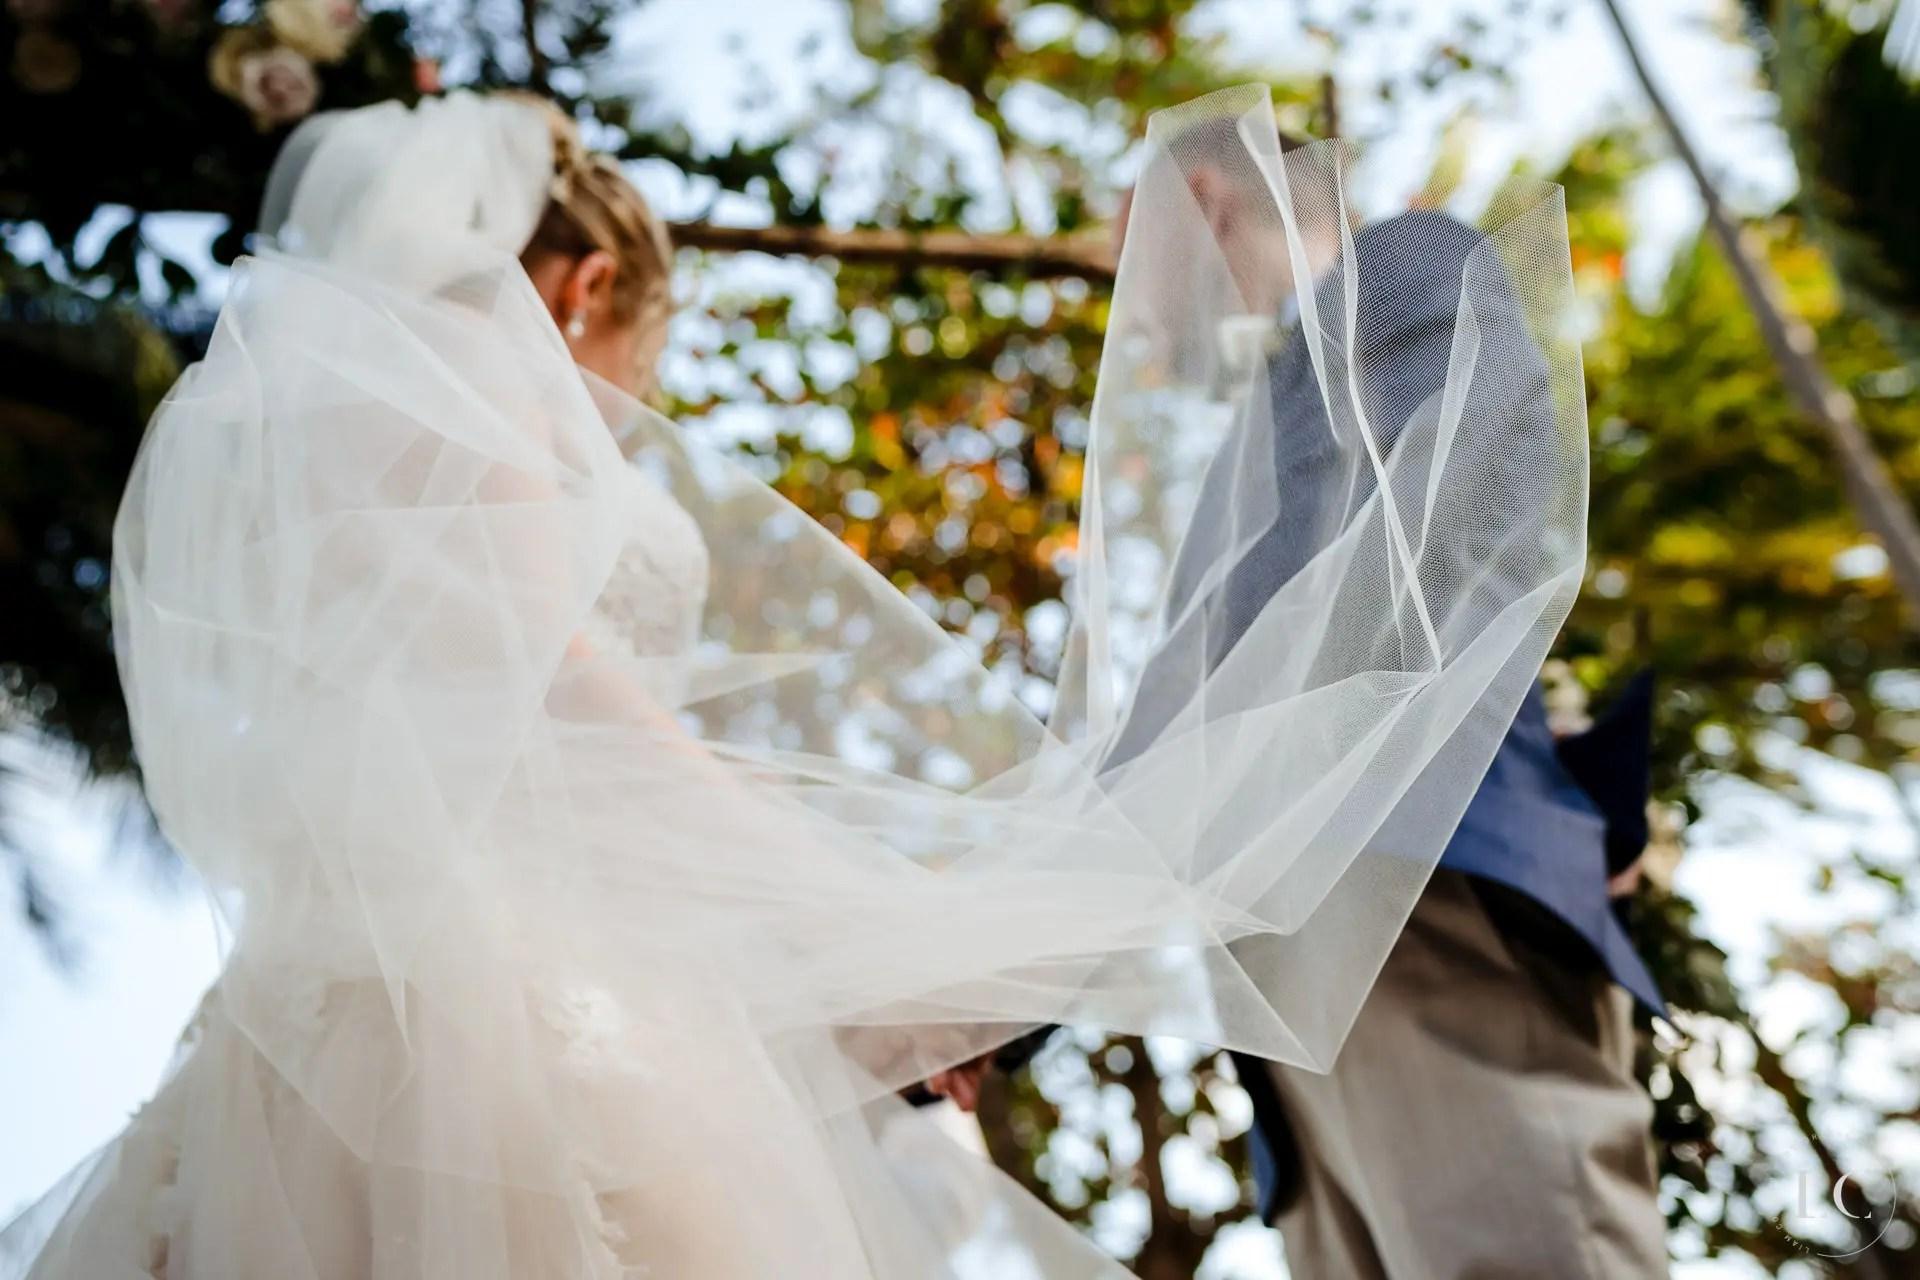 Bride's veil at the altar